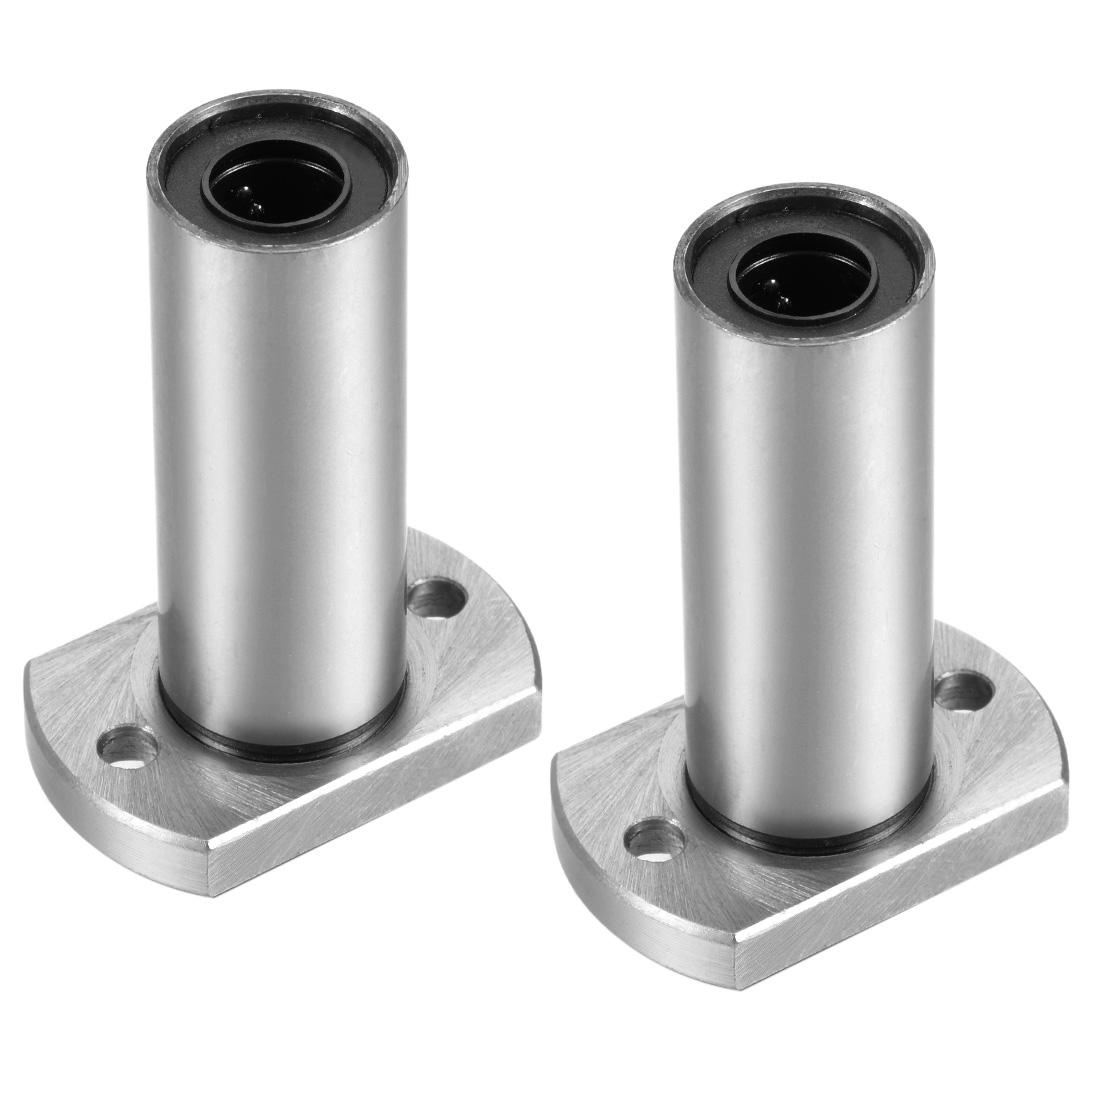 12mm Linear Ball Bearings Two Side Cut Flange LMH12LUU 12mm Bore 57mm Long 2pcs